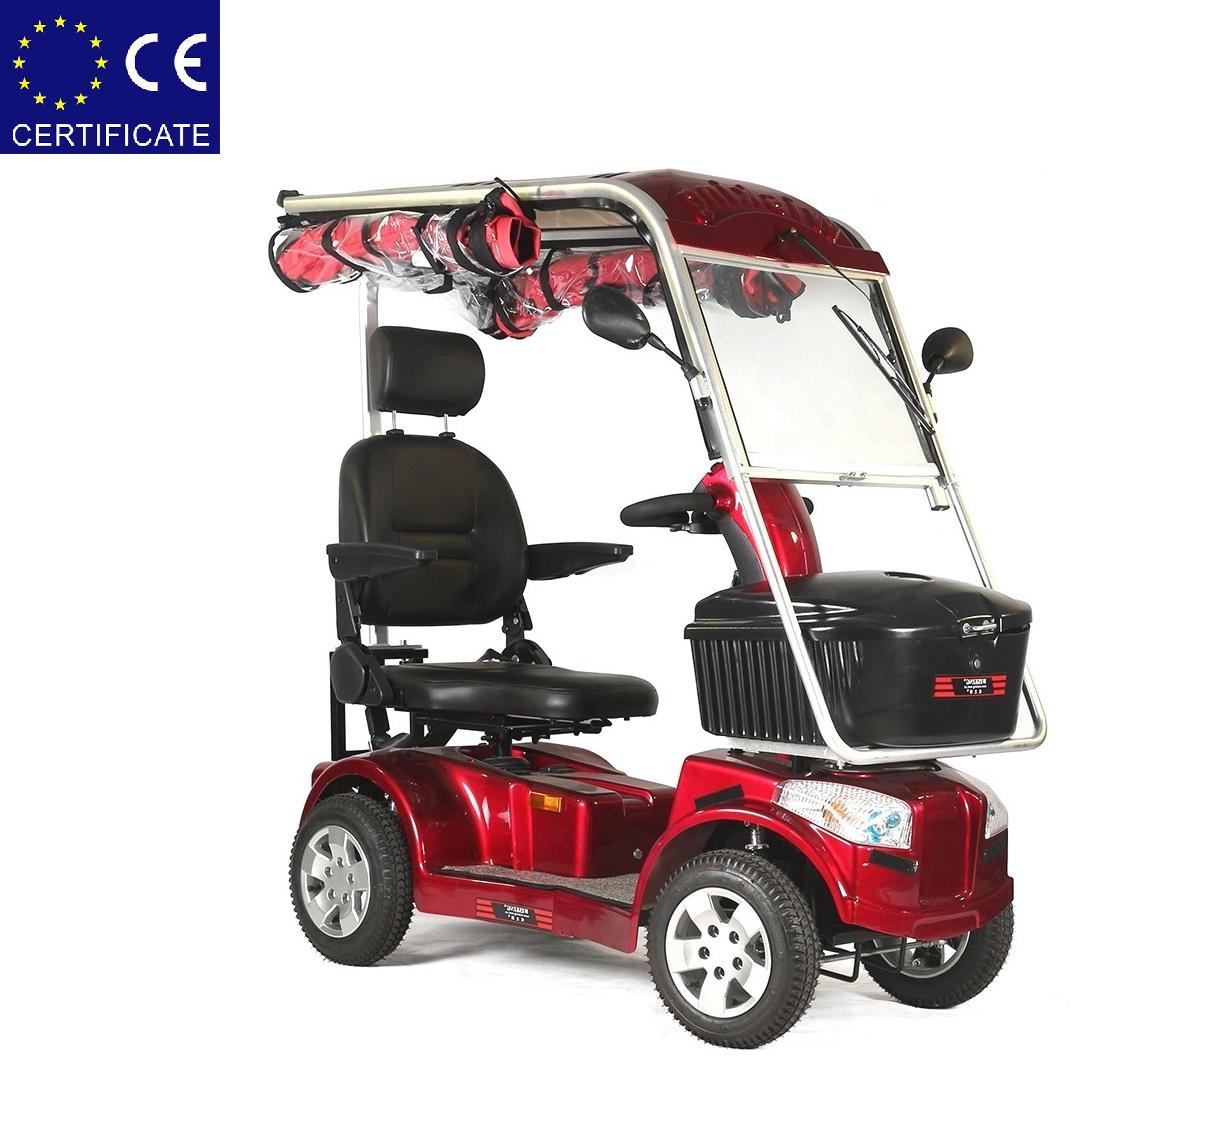 Скутер для инвалидов 4026. Электроскутер. Электрический скутер.